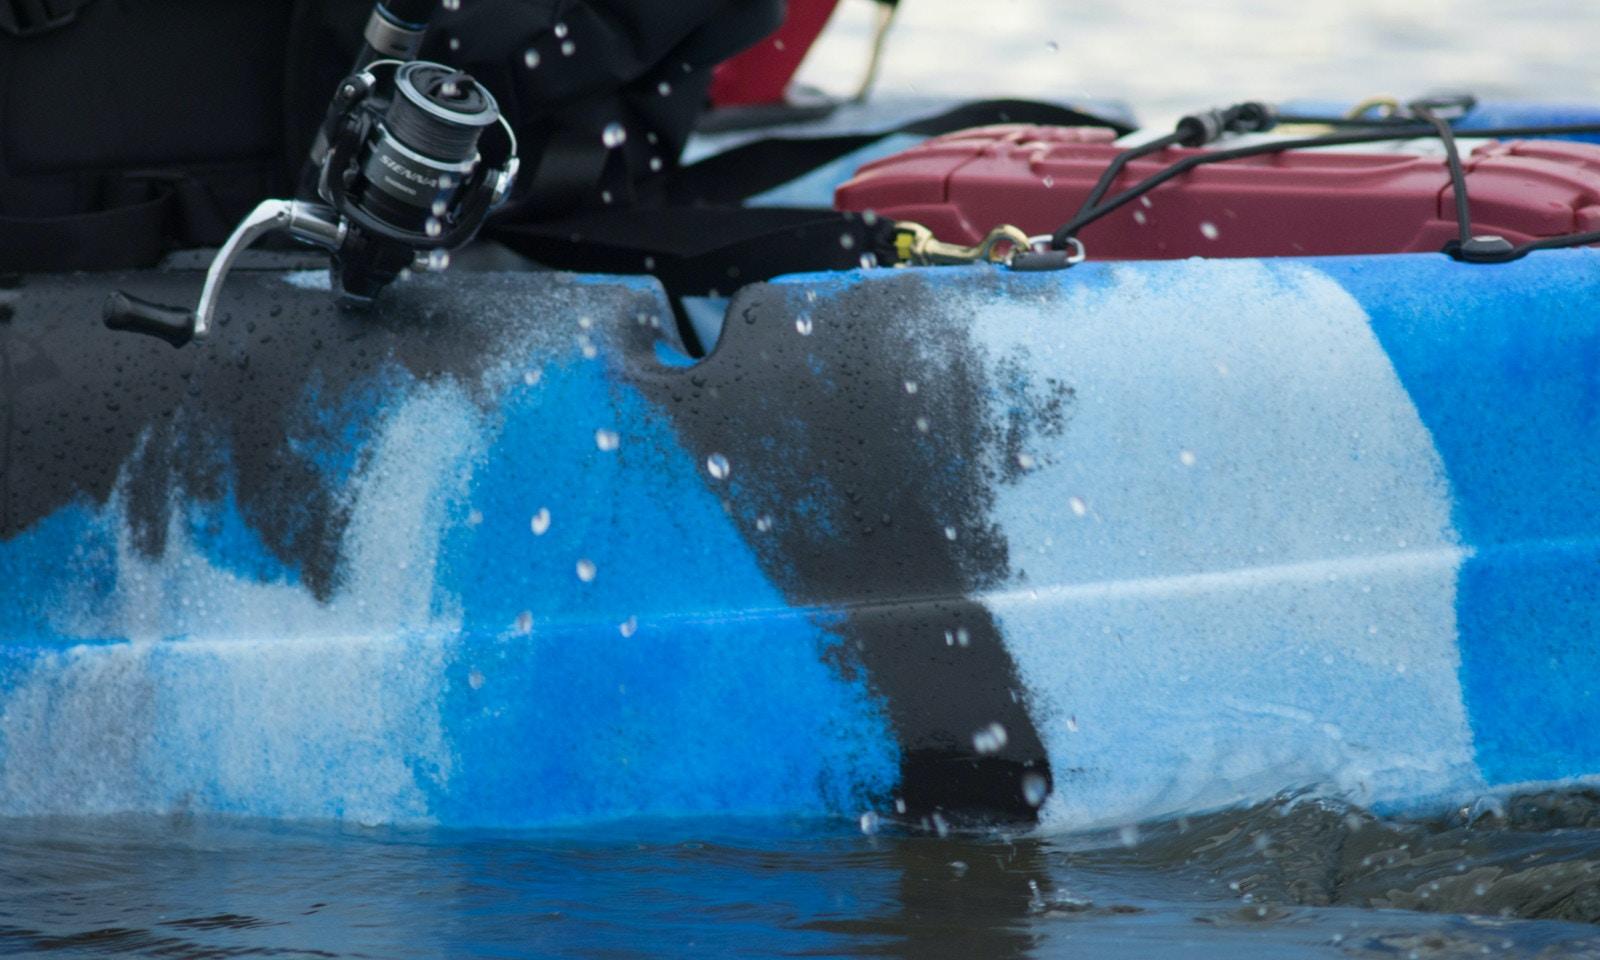 Dream Kayaks | Dream Catcher 4 Review